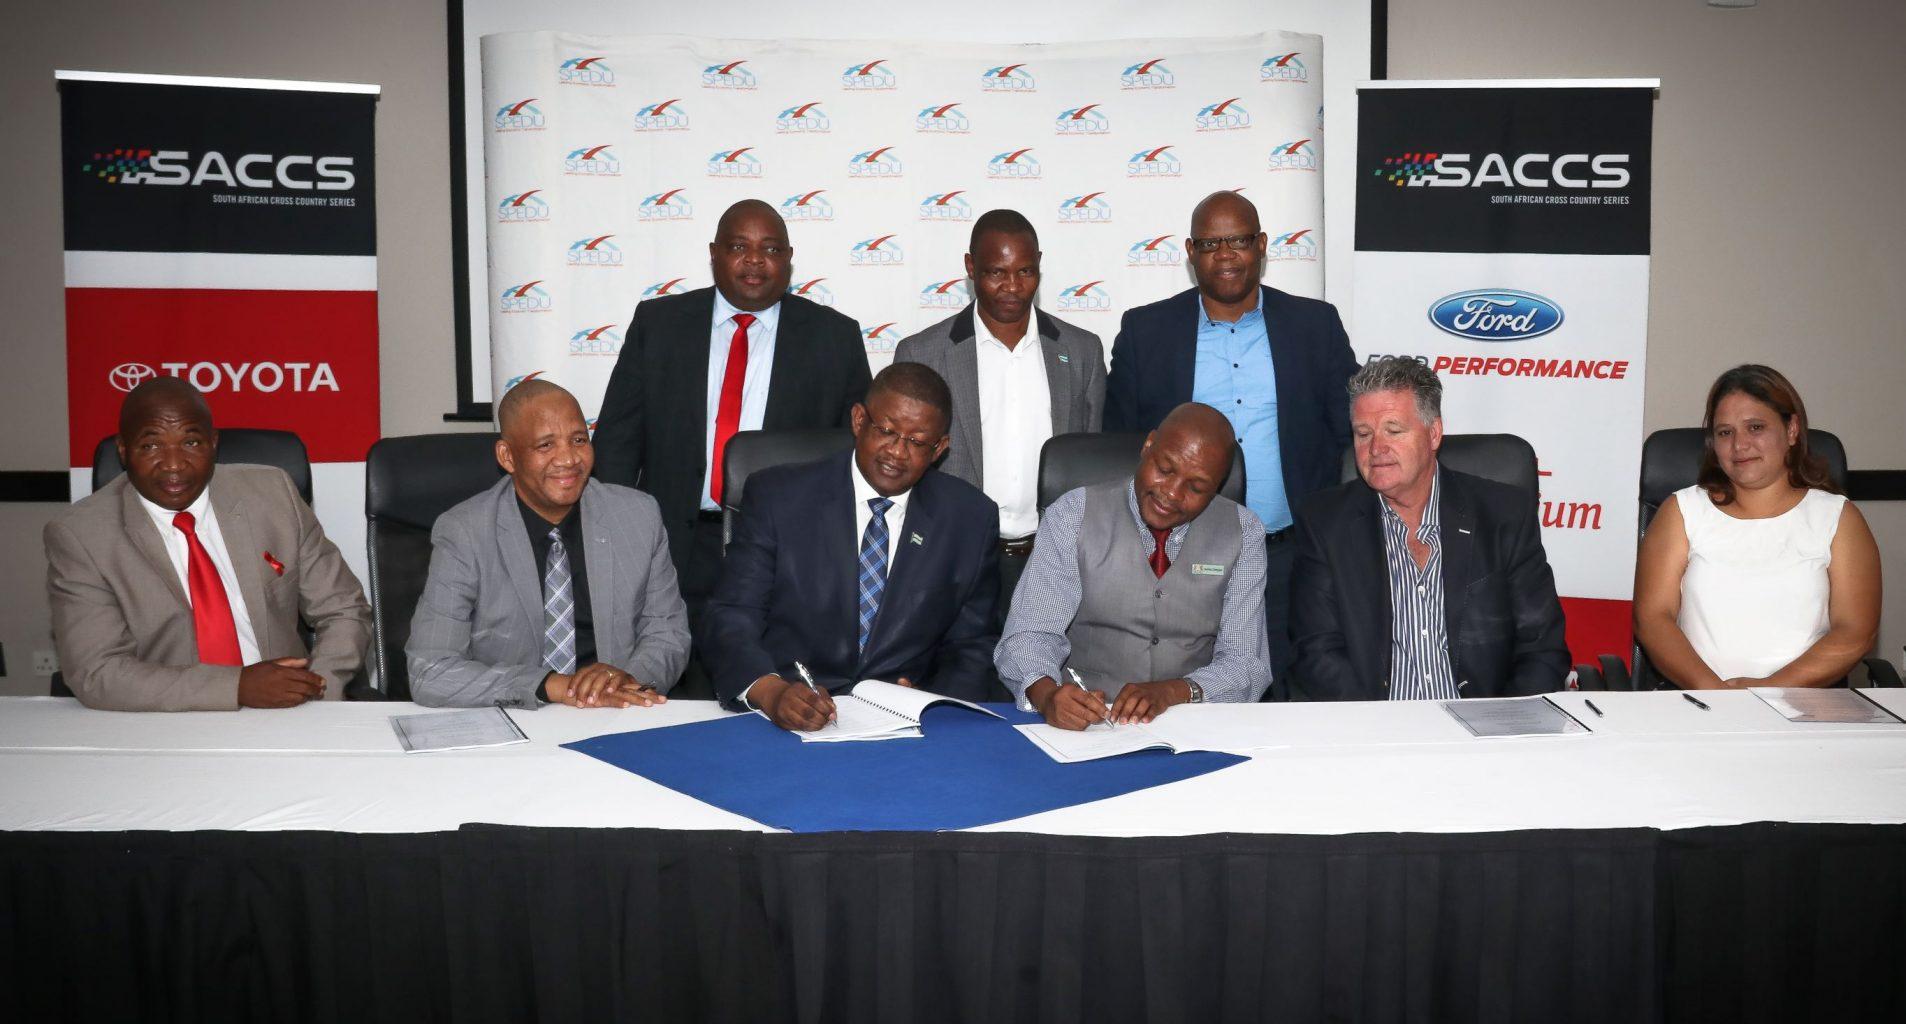 Signing of the memorandum of agrrement - TDR 1000